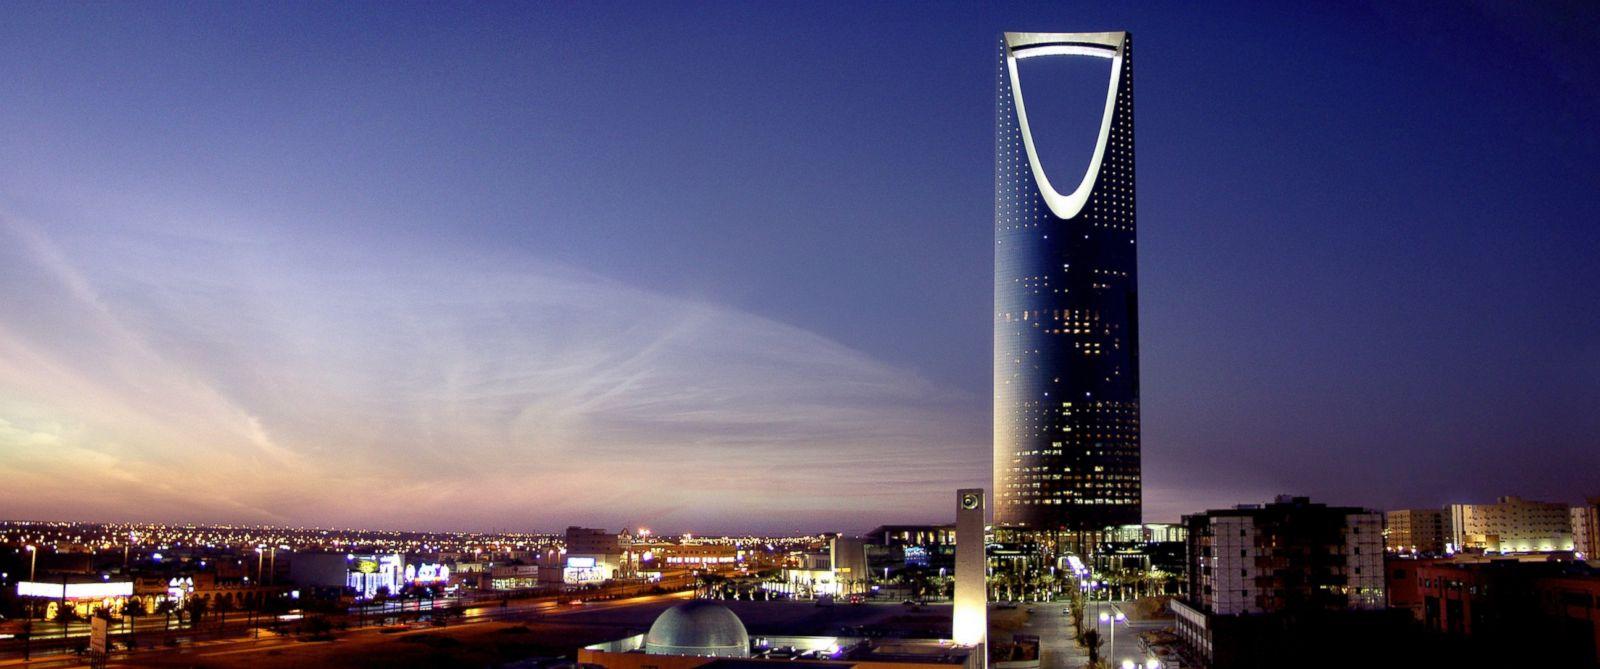 Saudi Arabia Investment Bank